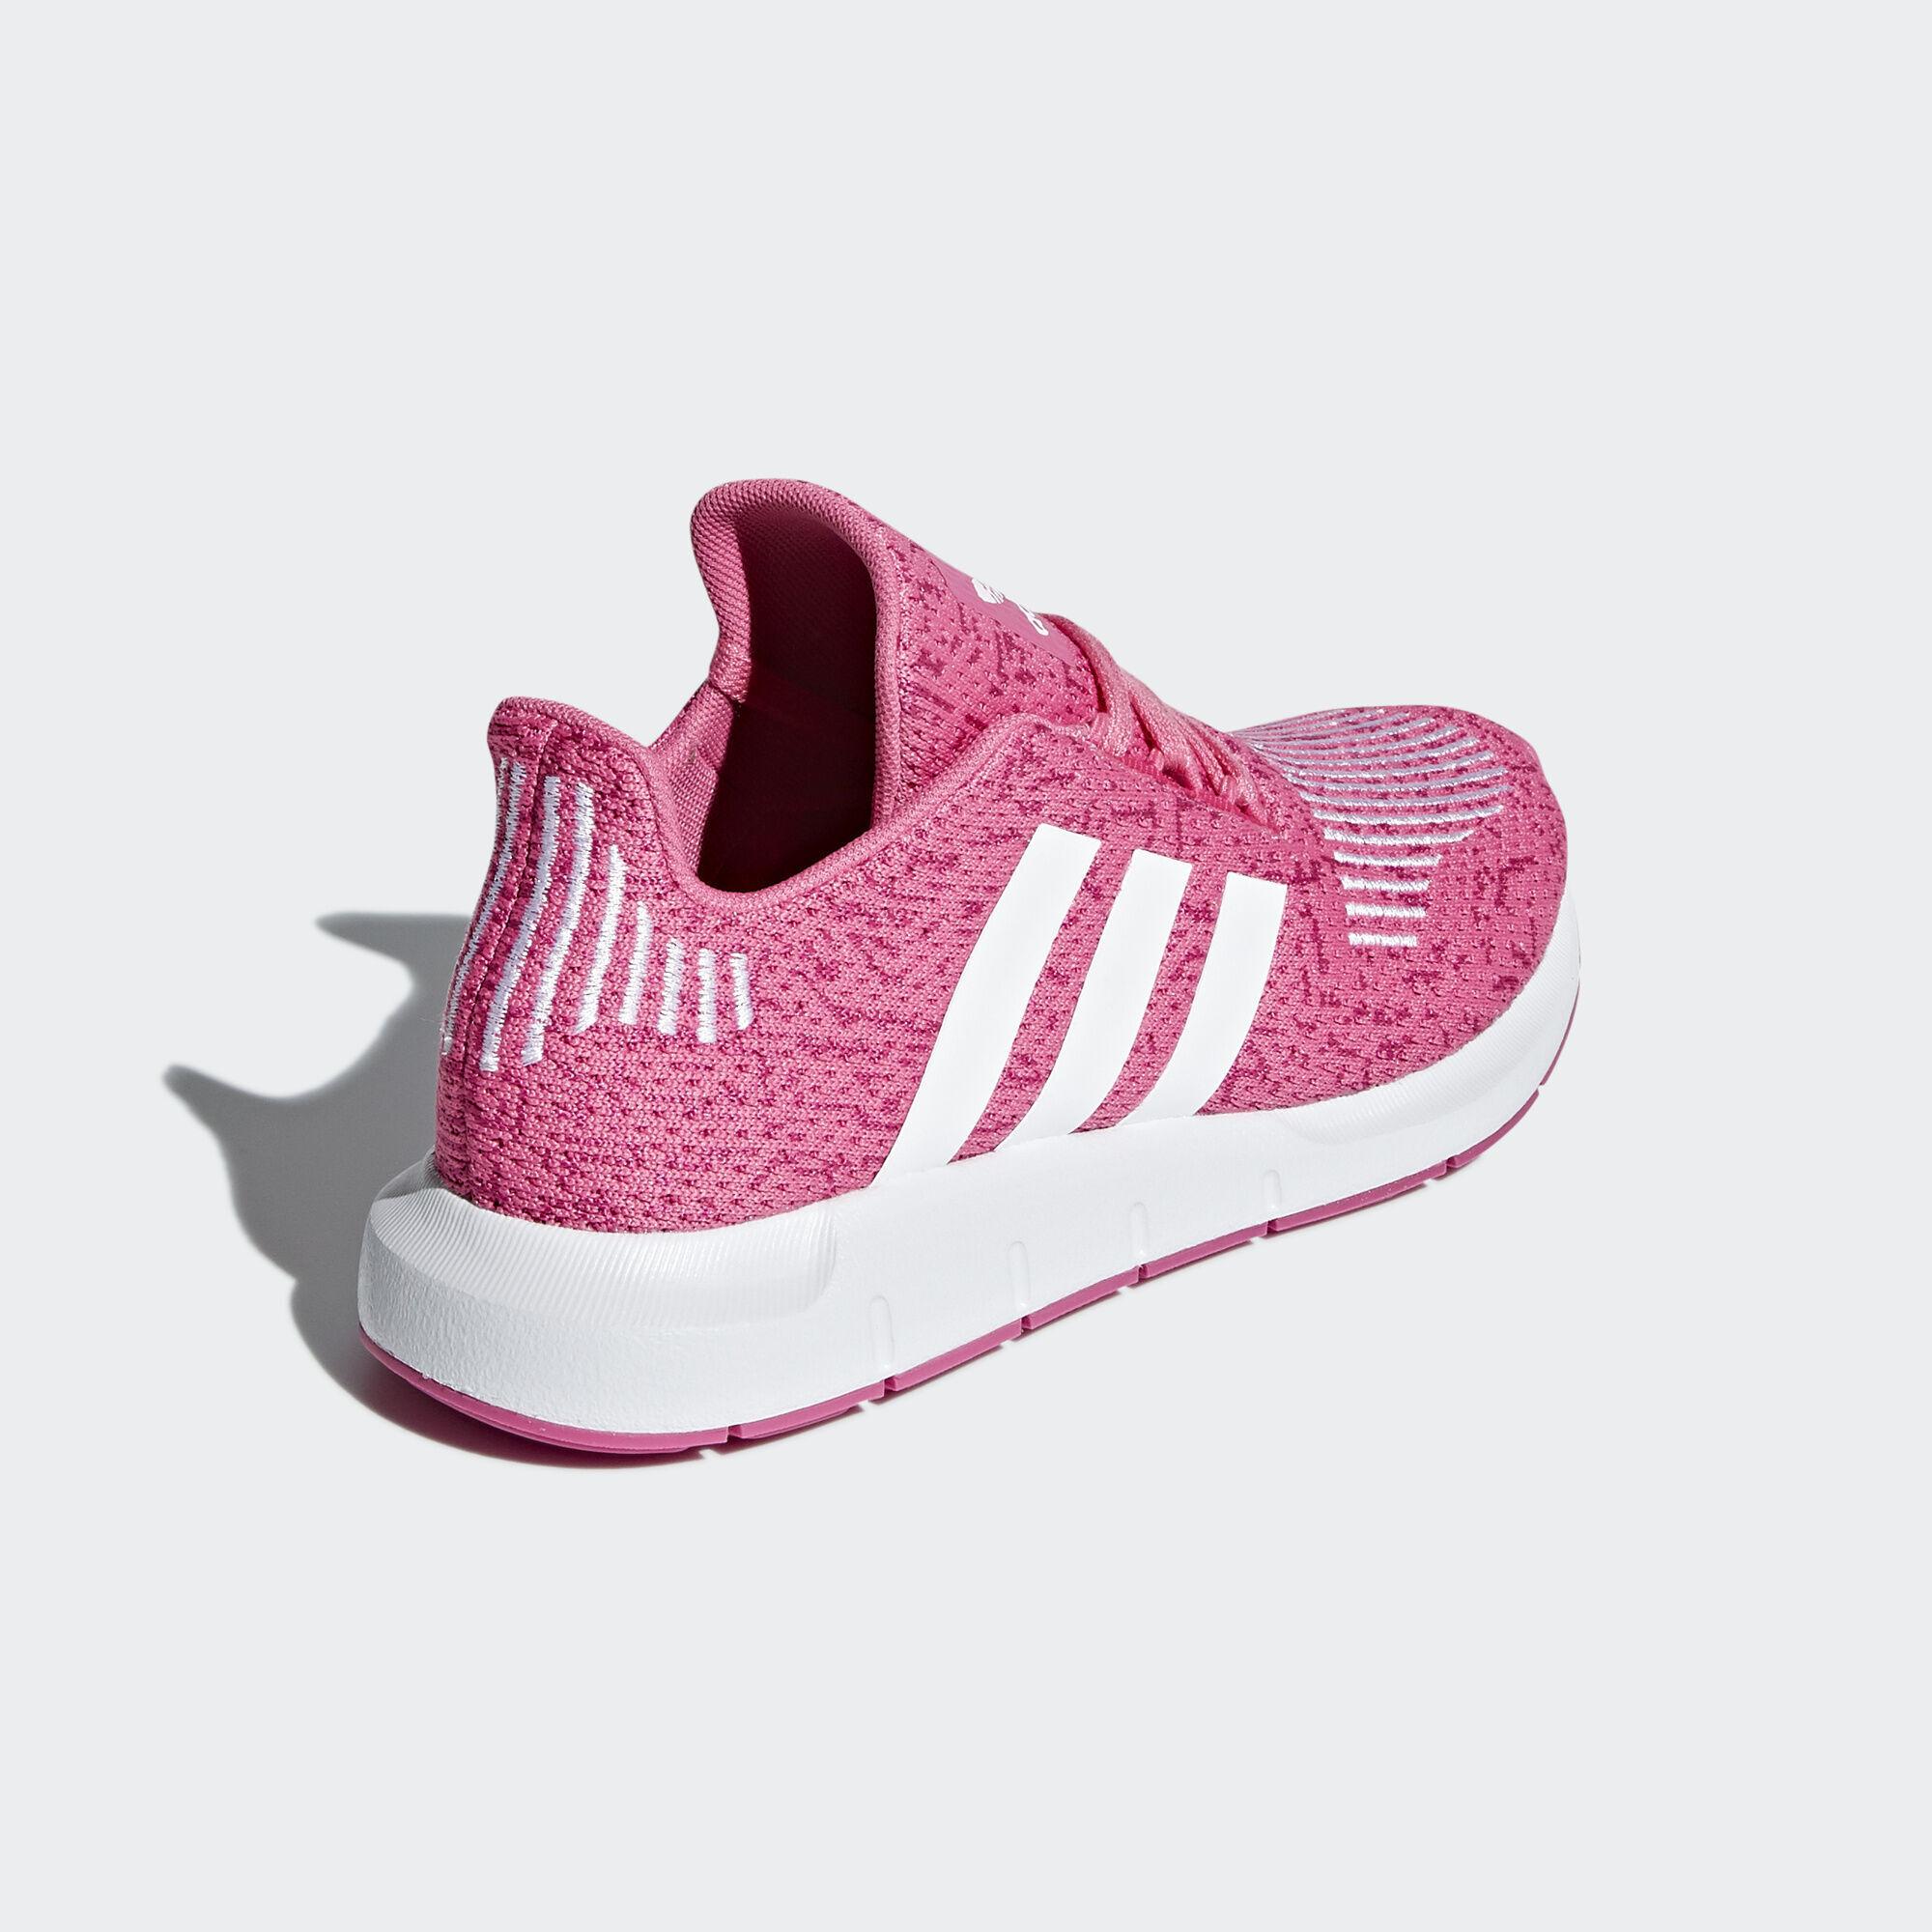 adidas Swift Run Shoes Pink | adidas Philipines